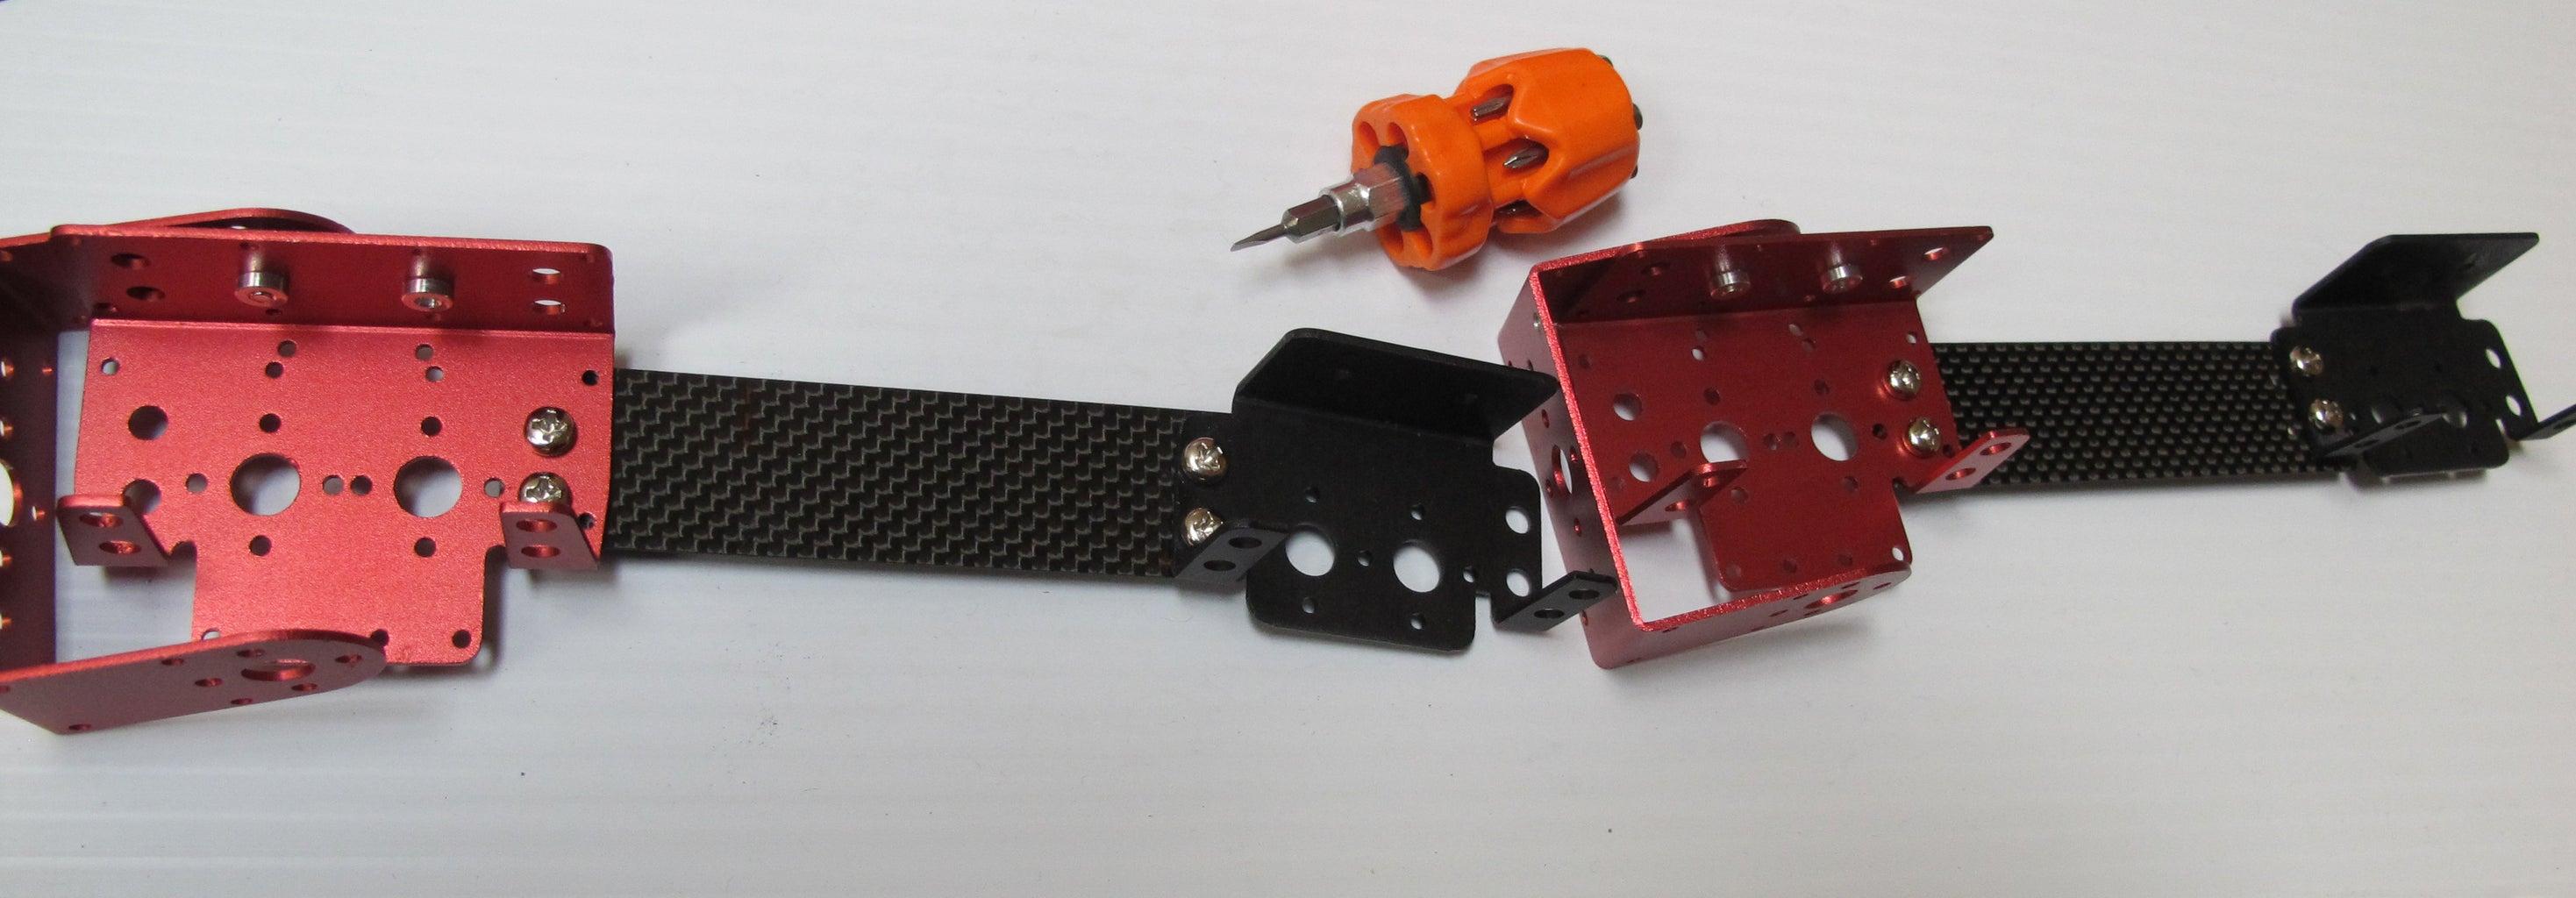 Prepare the Frame: Attach the Brackets to the Carbon Fiber